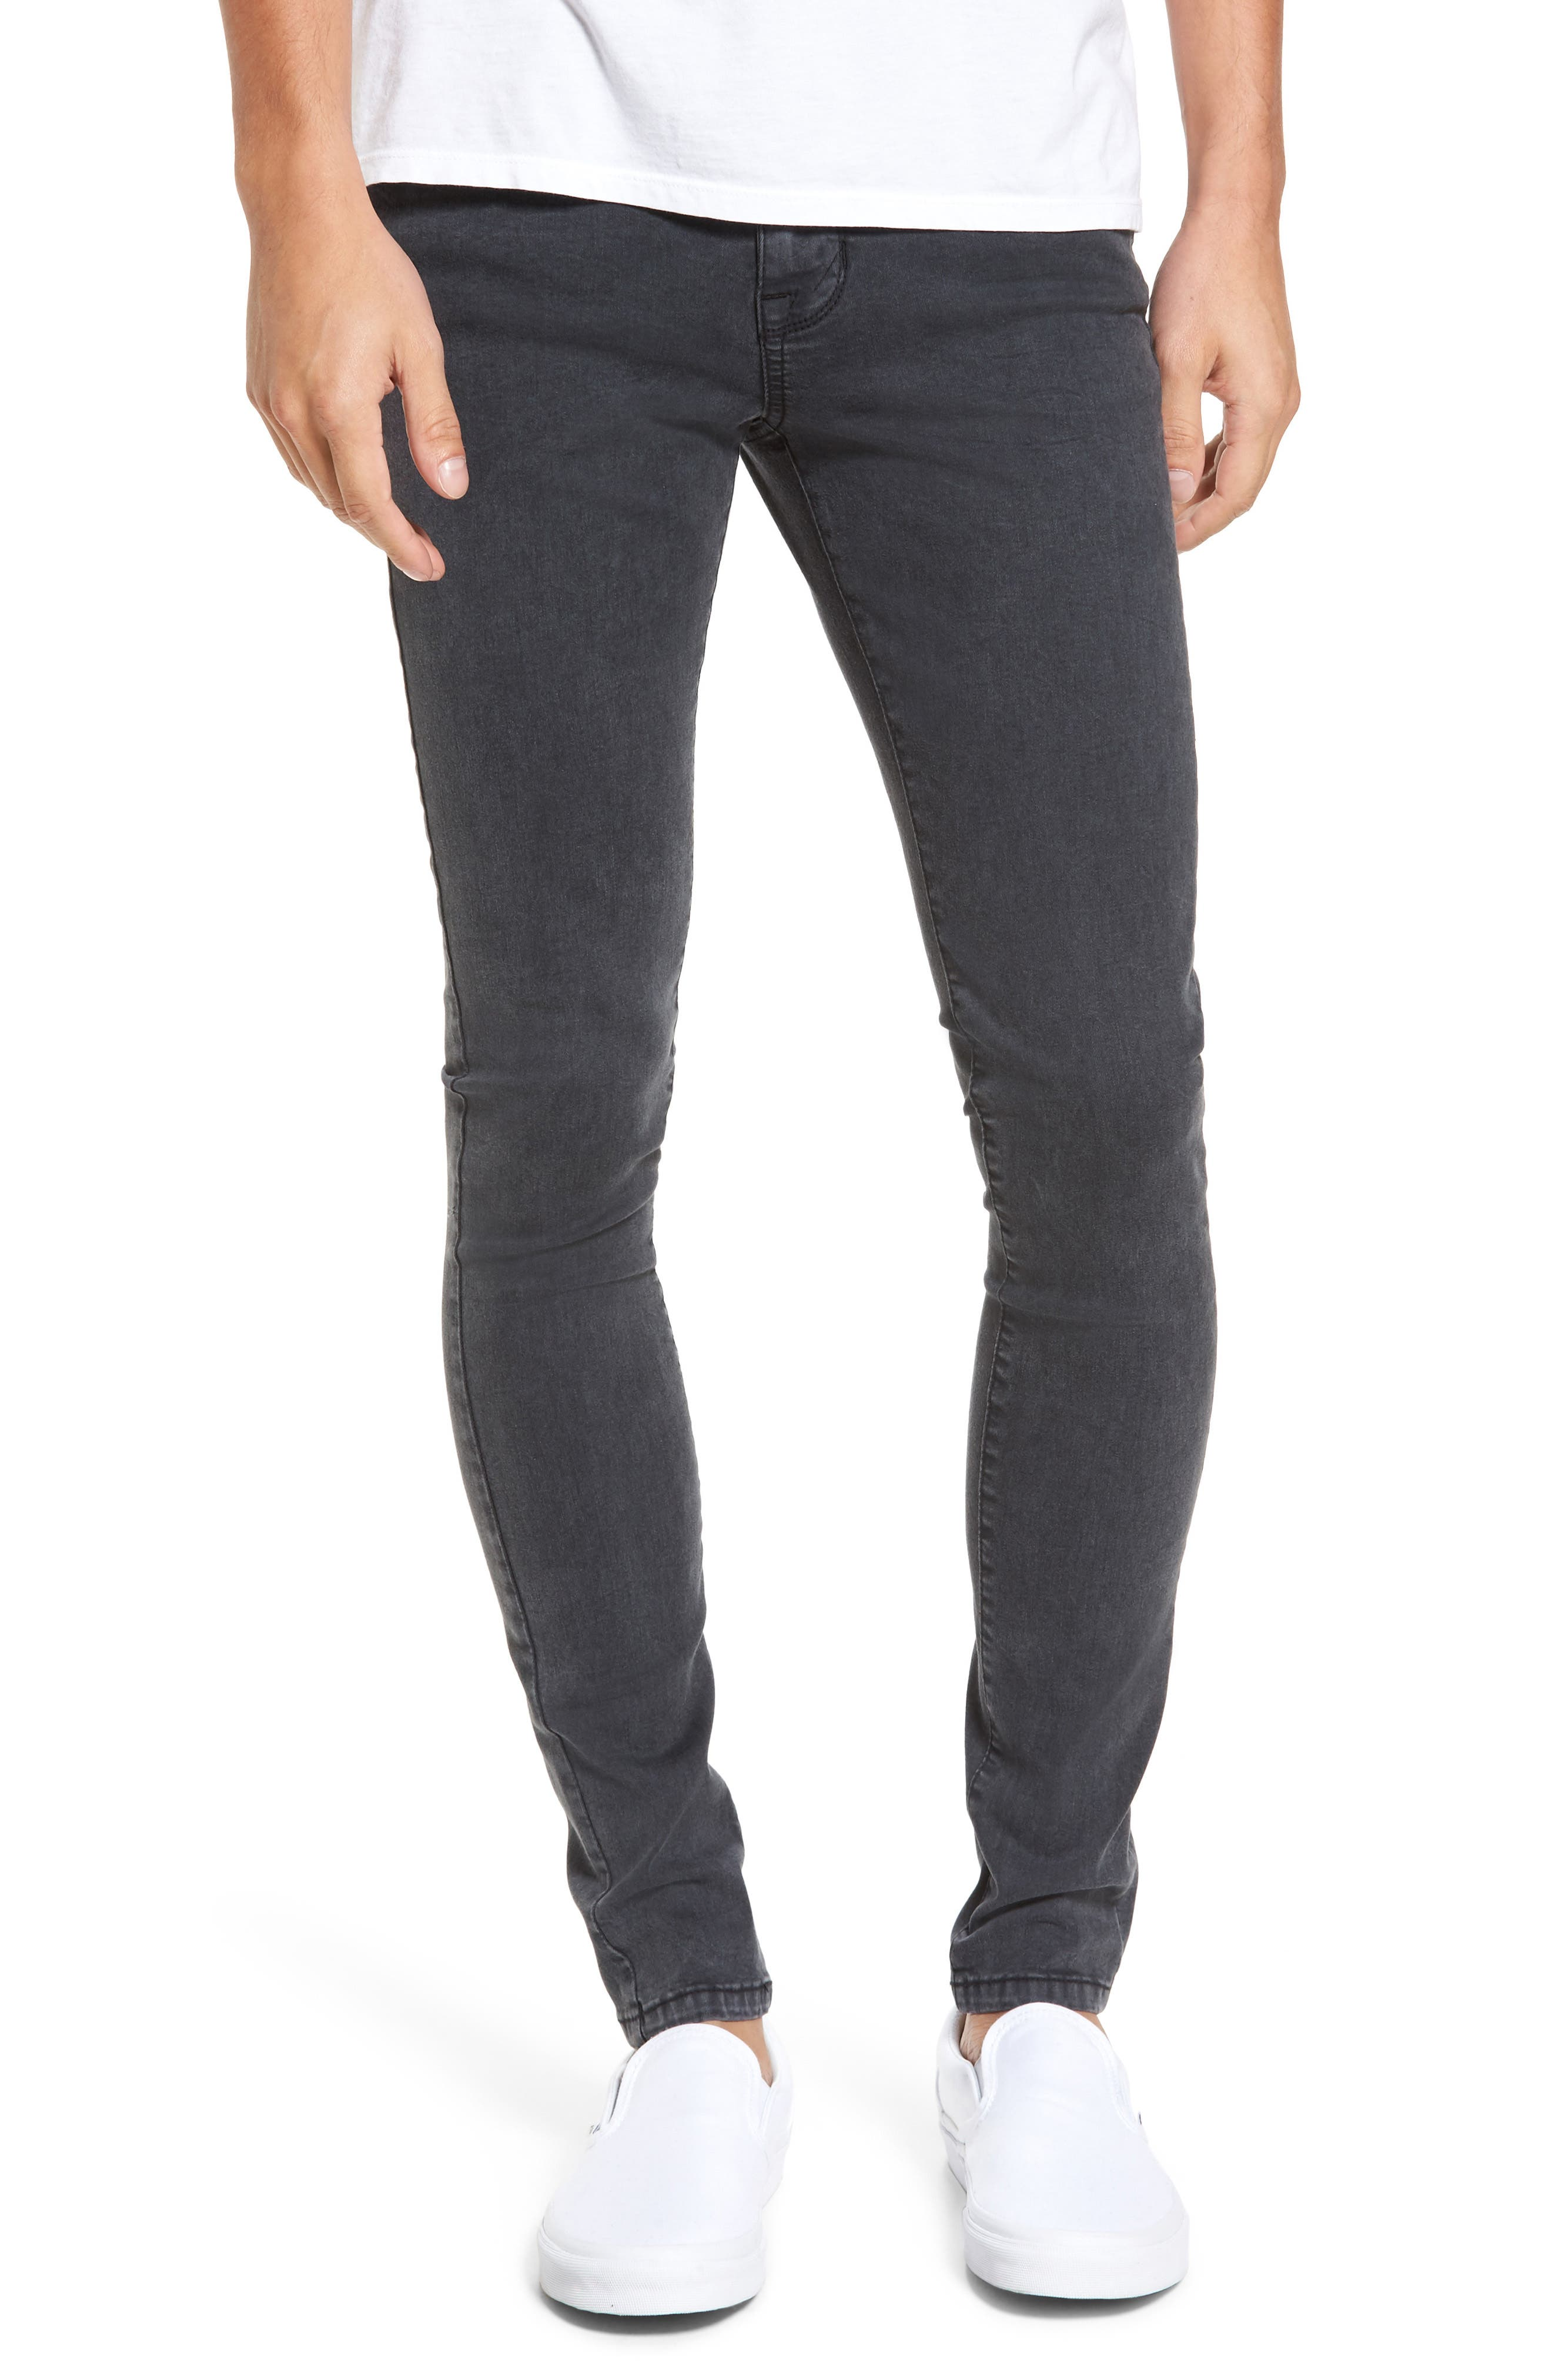 Main Image - Dr. Denim Supply Co. Leroy Slim Fit Jeans